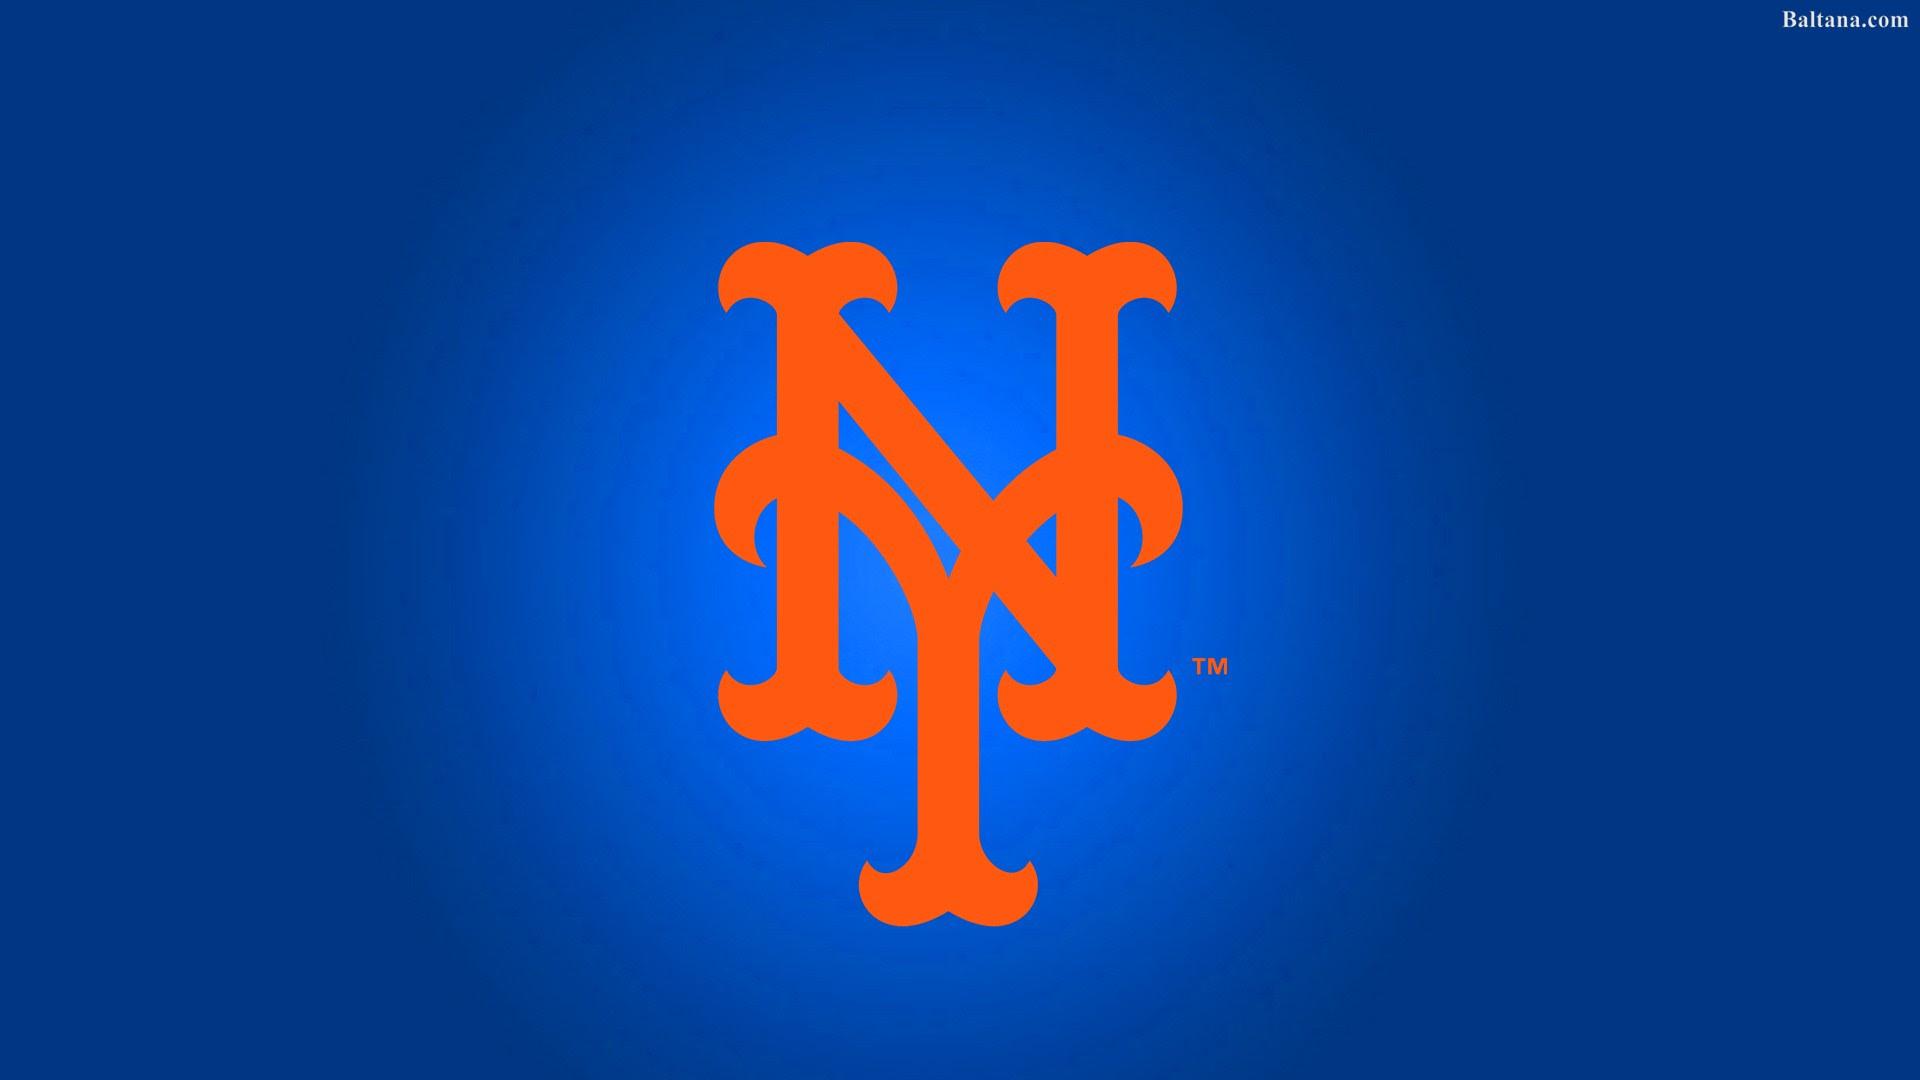 New York Mets Widescreen Wallpapers 33220 Baltana